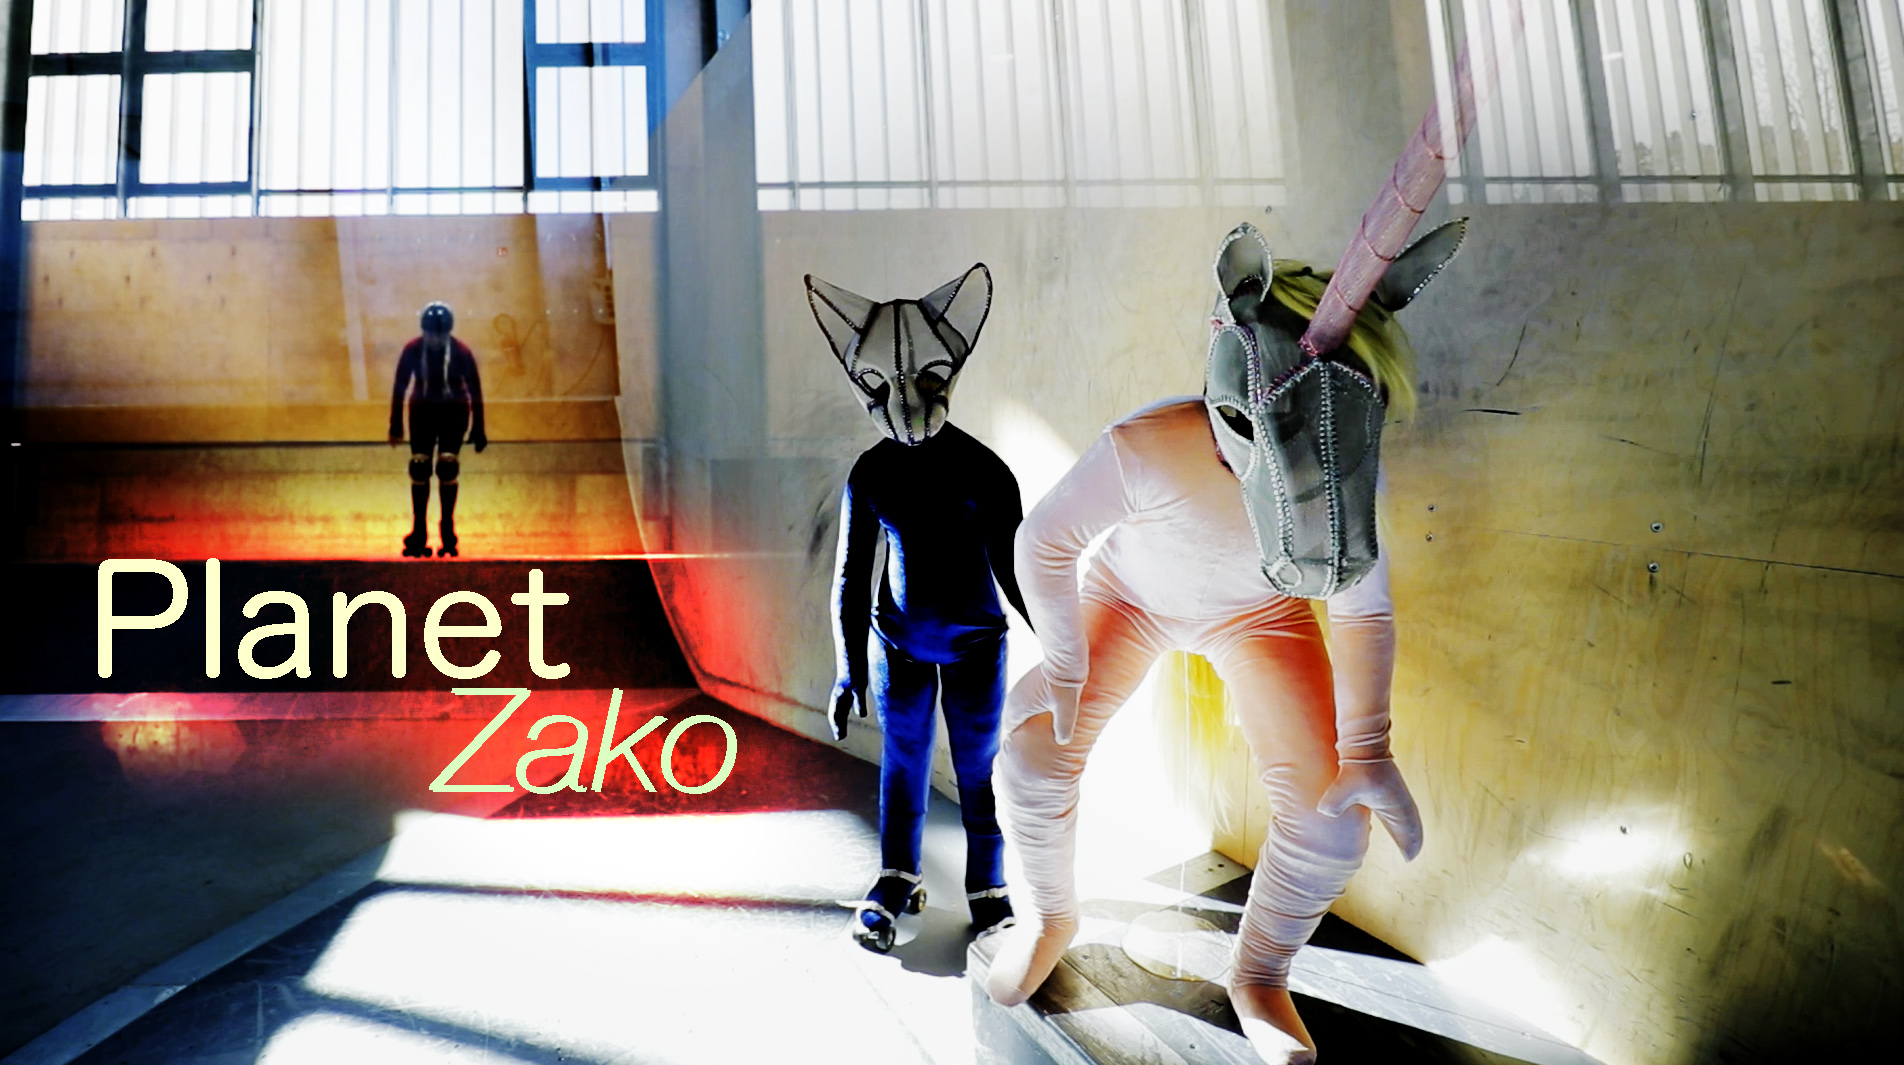 Planet Zako